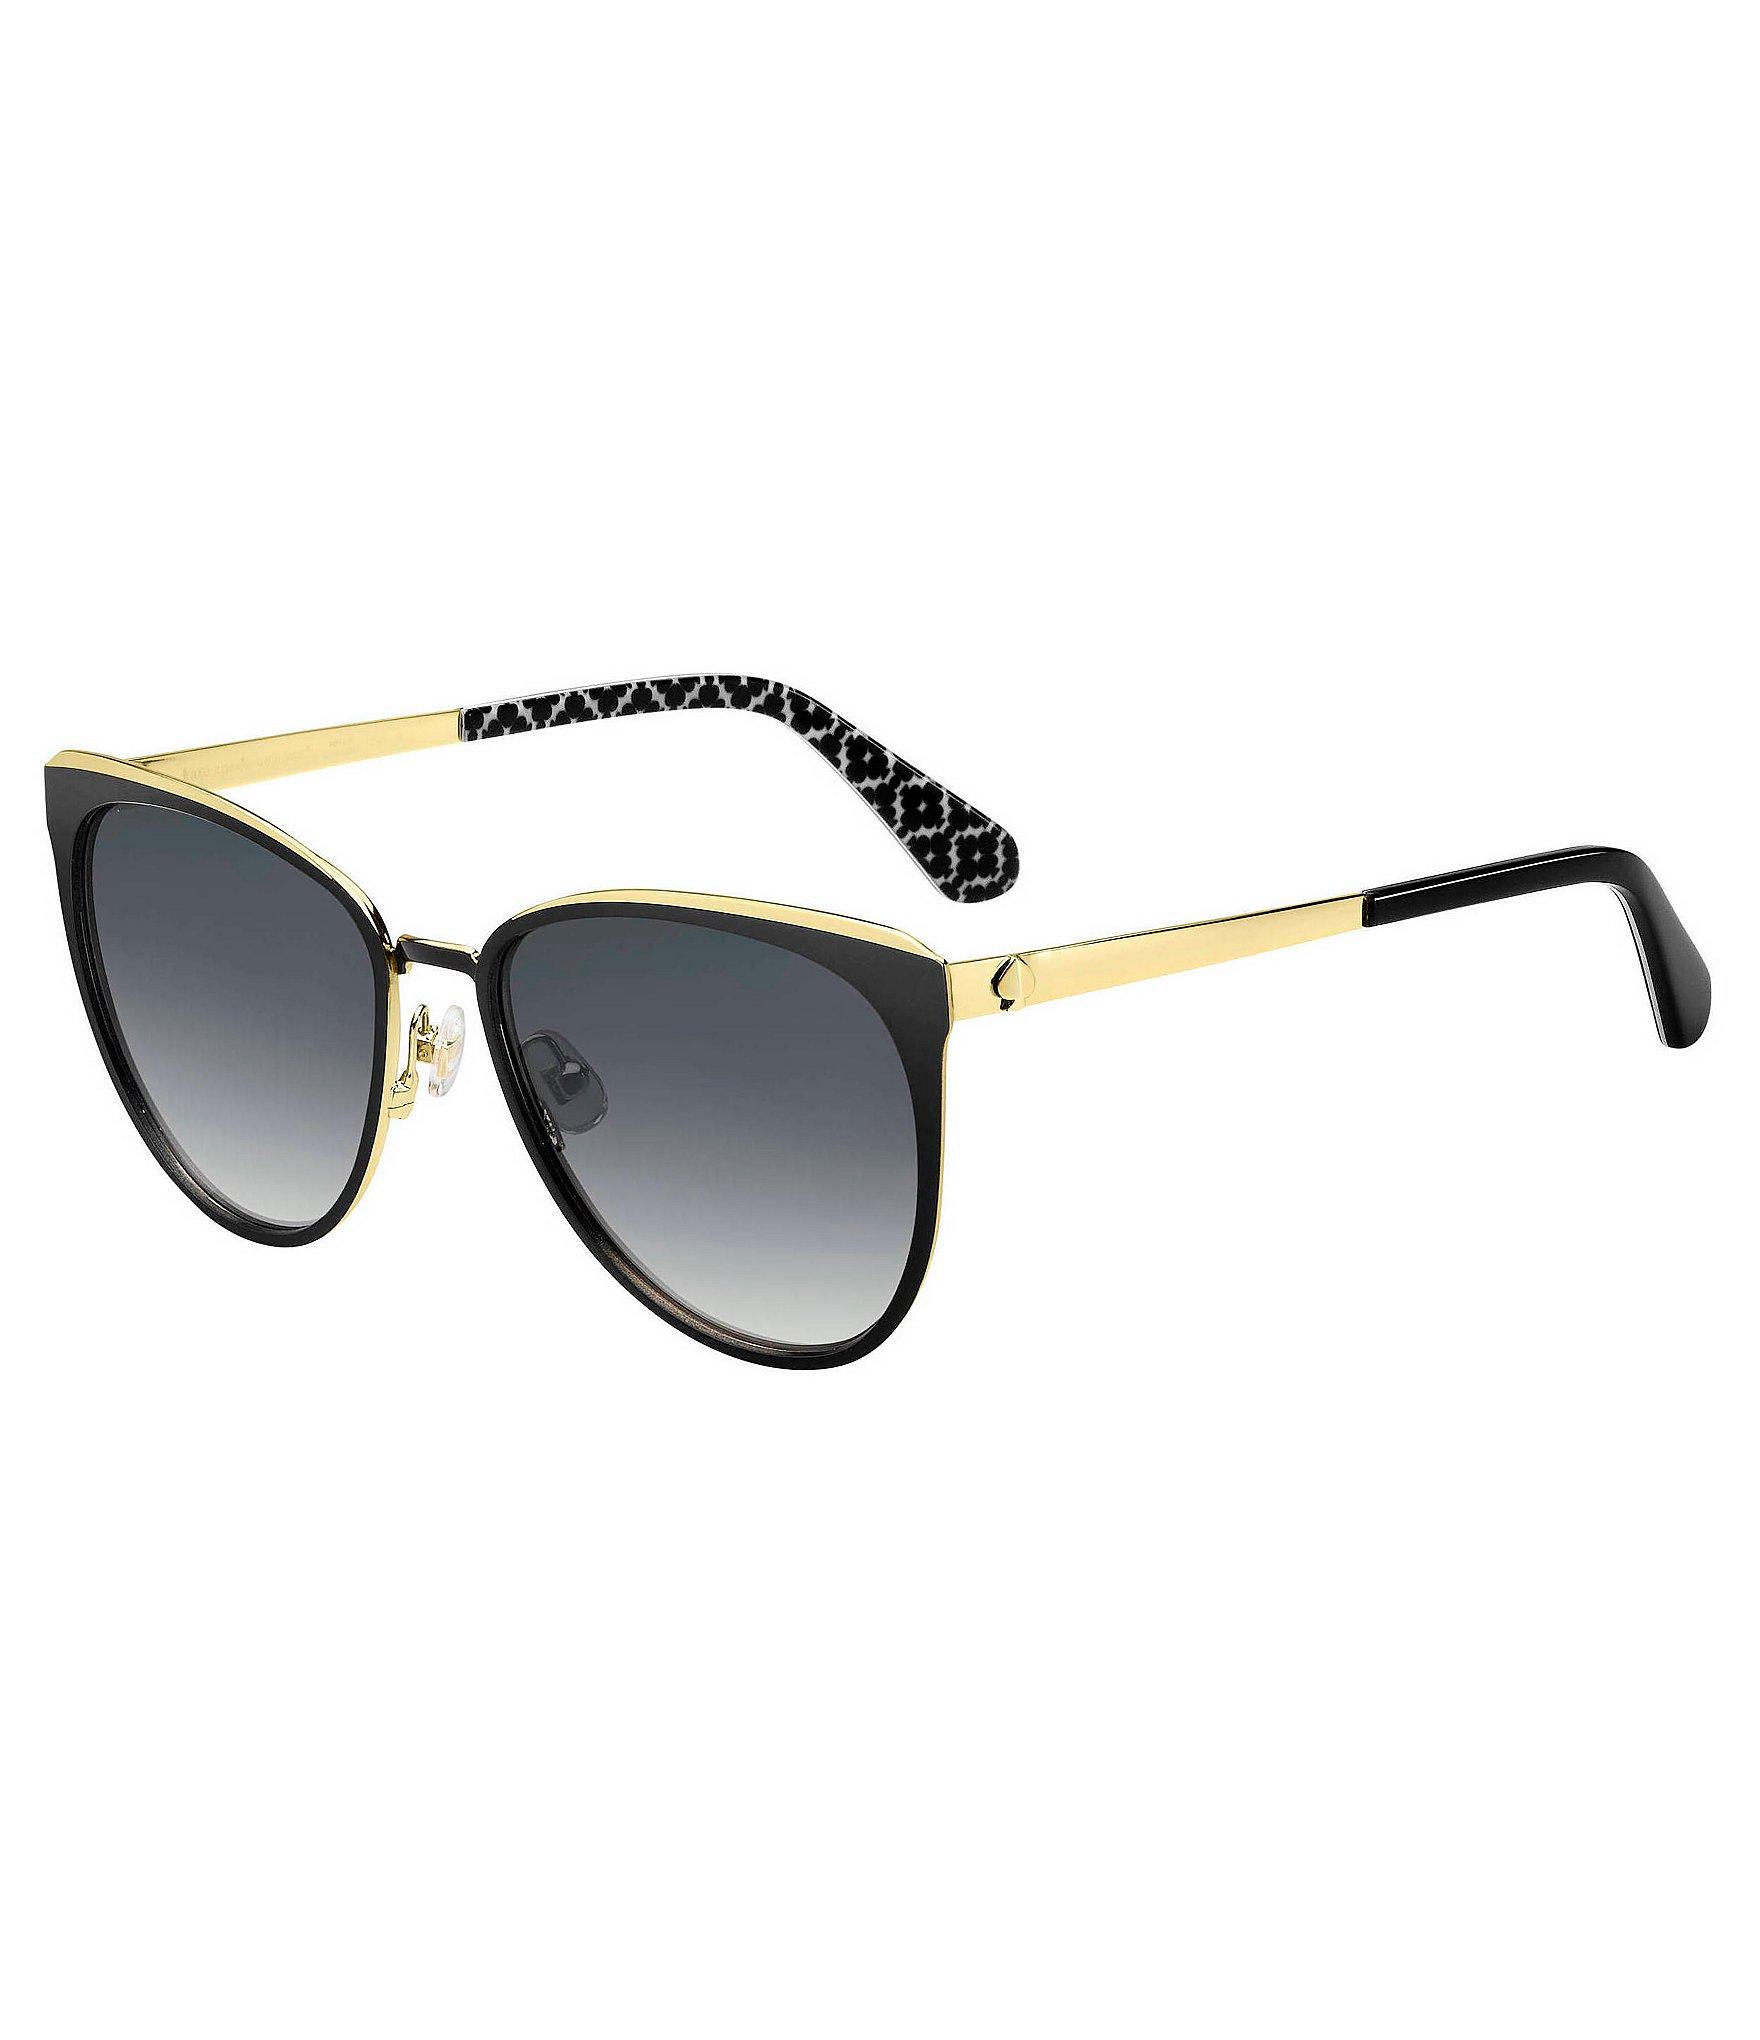 8b235c0f0027 kate spade new york Women's Cat Eye Sunglasses | Dillard's